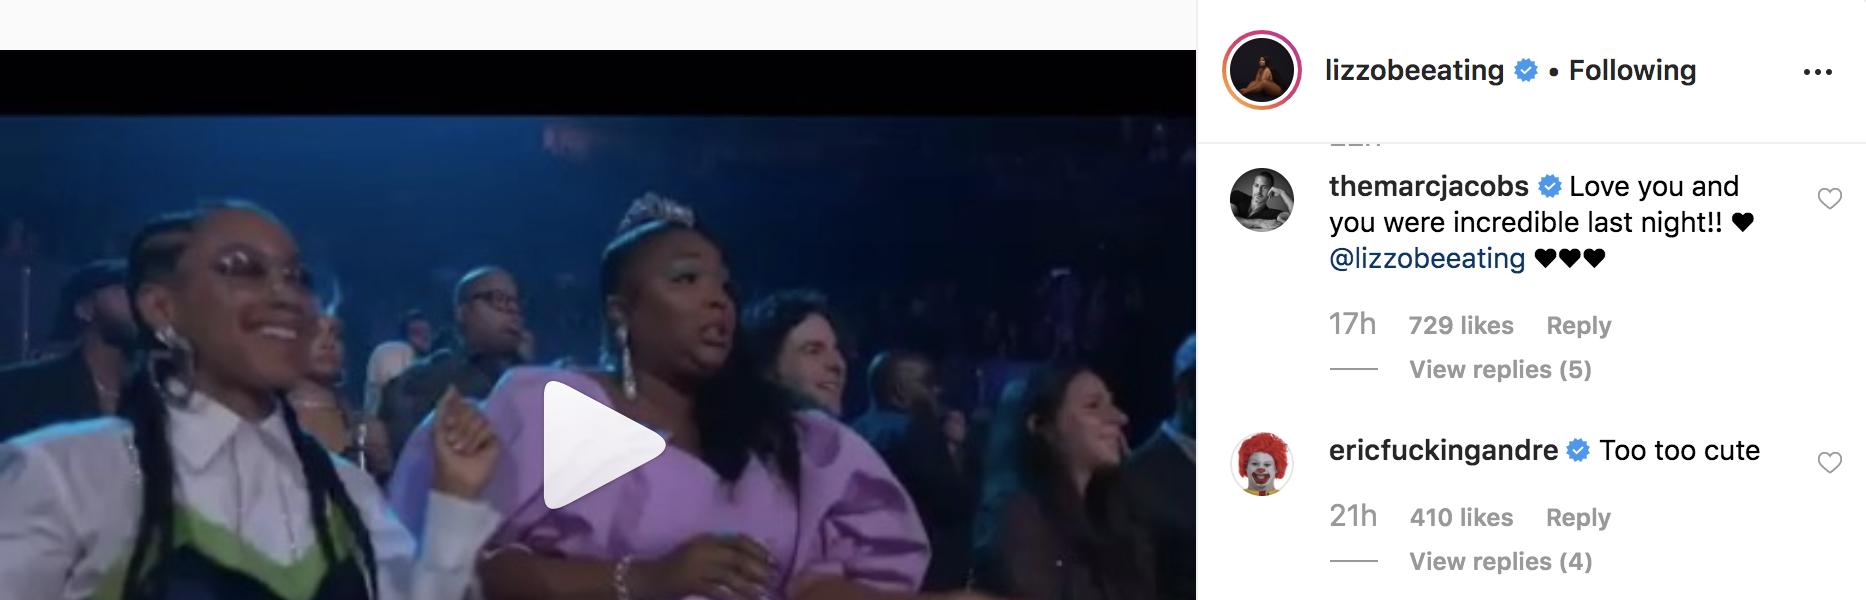 Lizzo Instagram